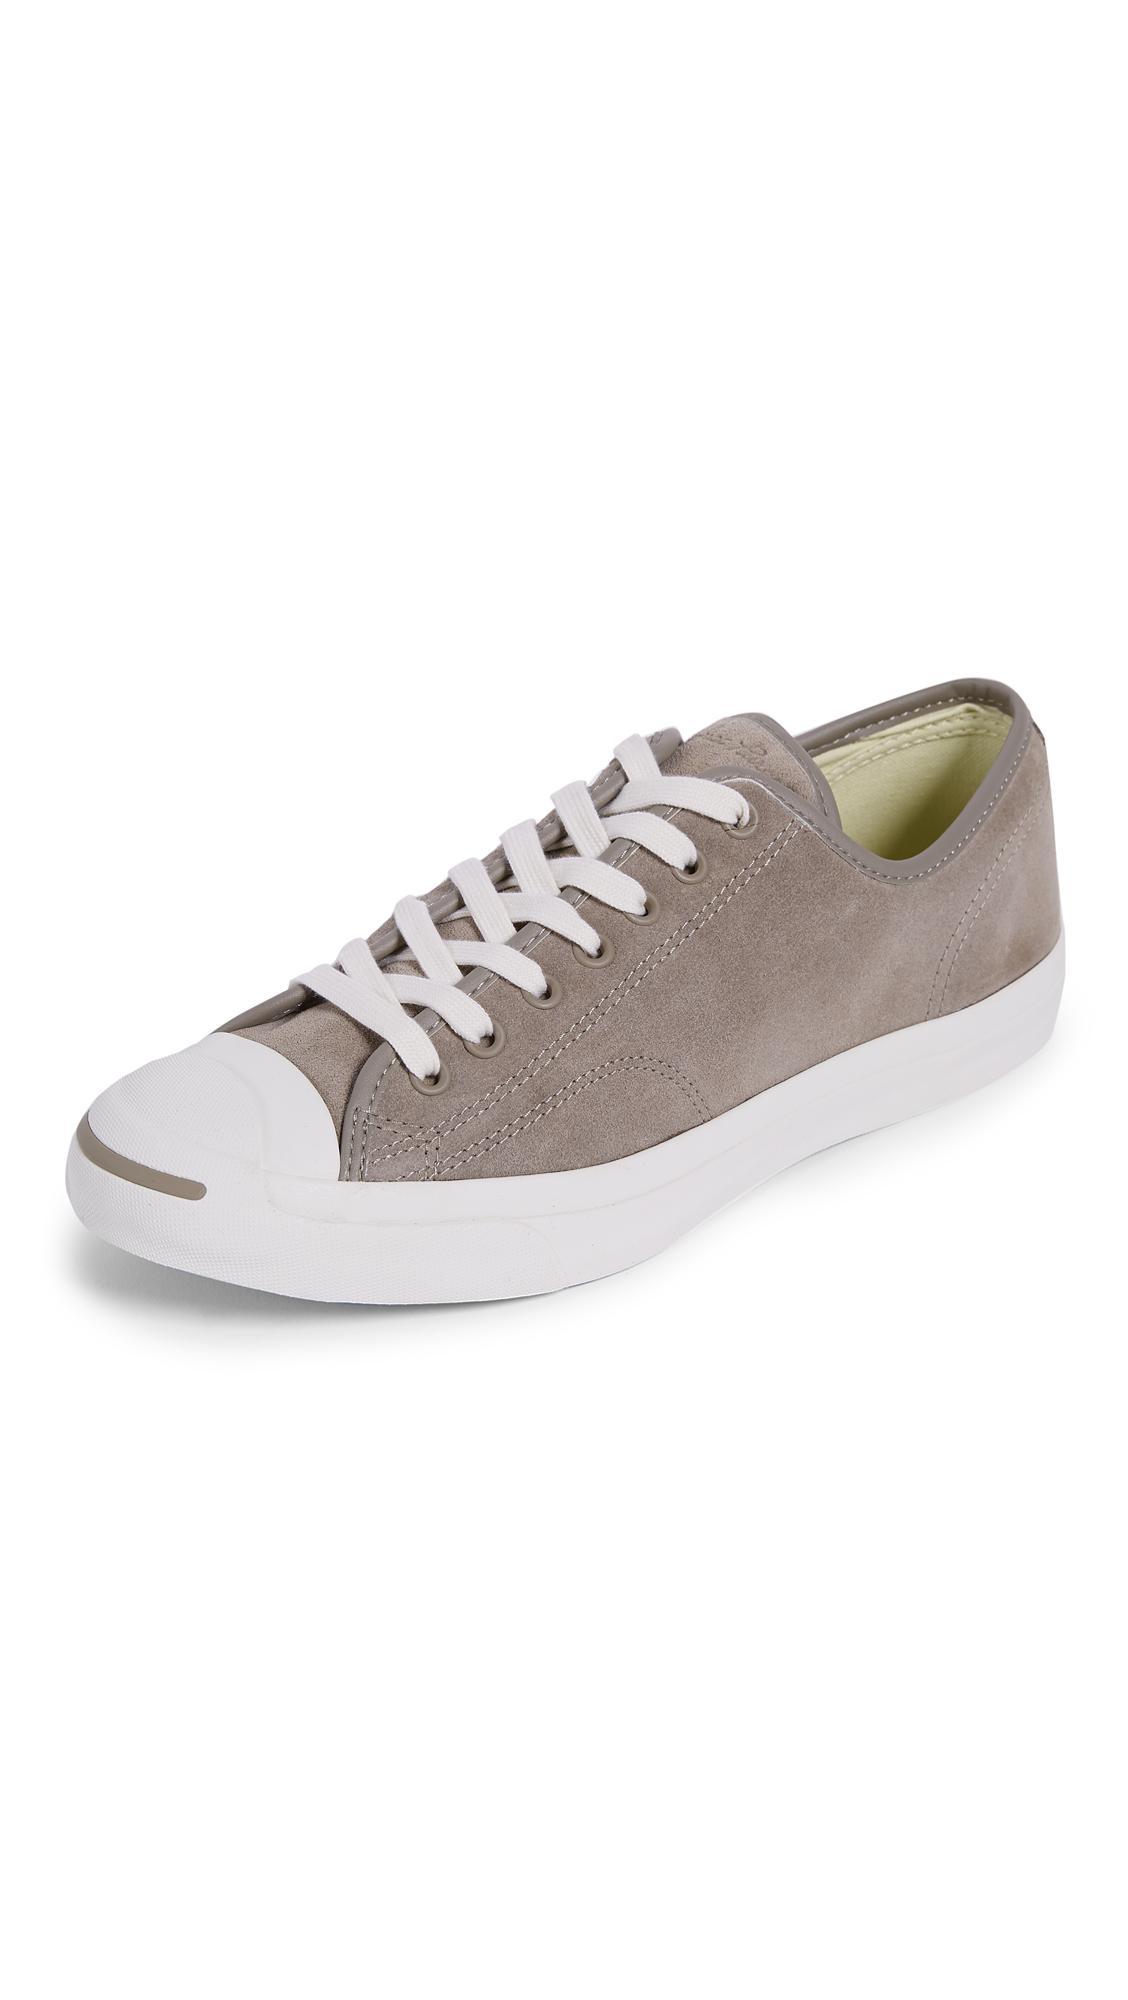 Converse Jack Purcell Jack Suede Sneakers In Malt/Egret